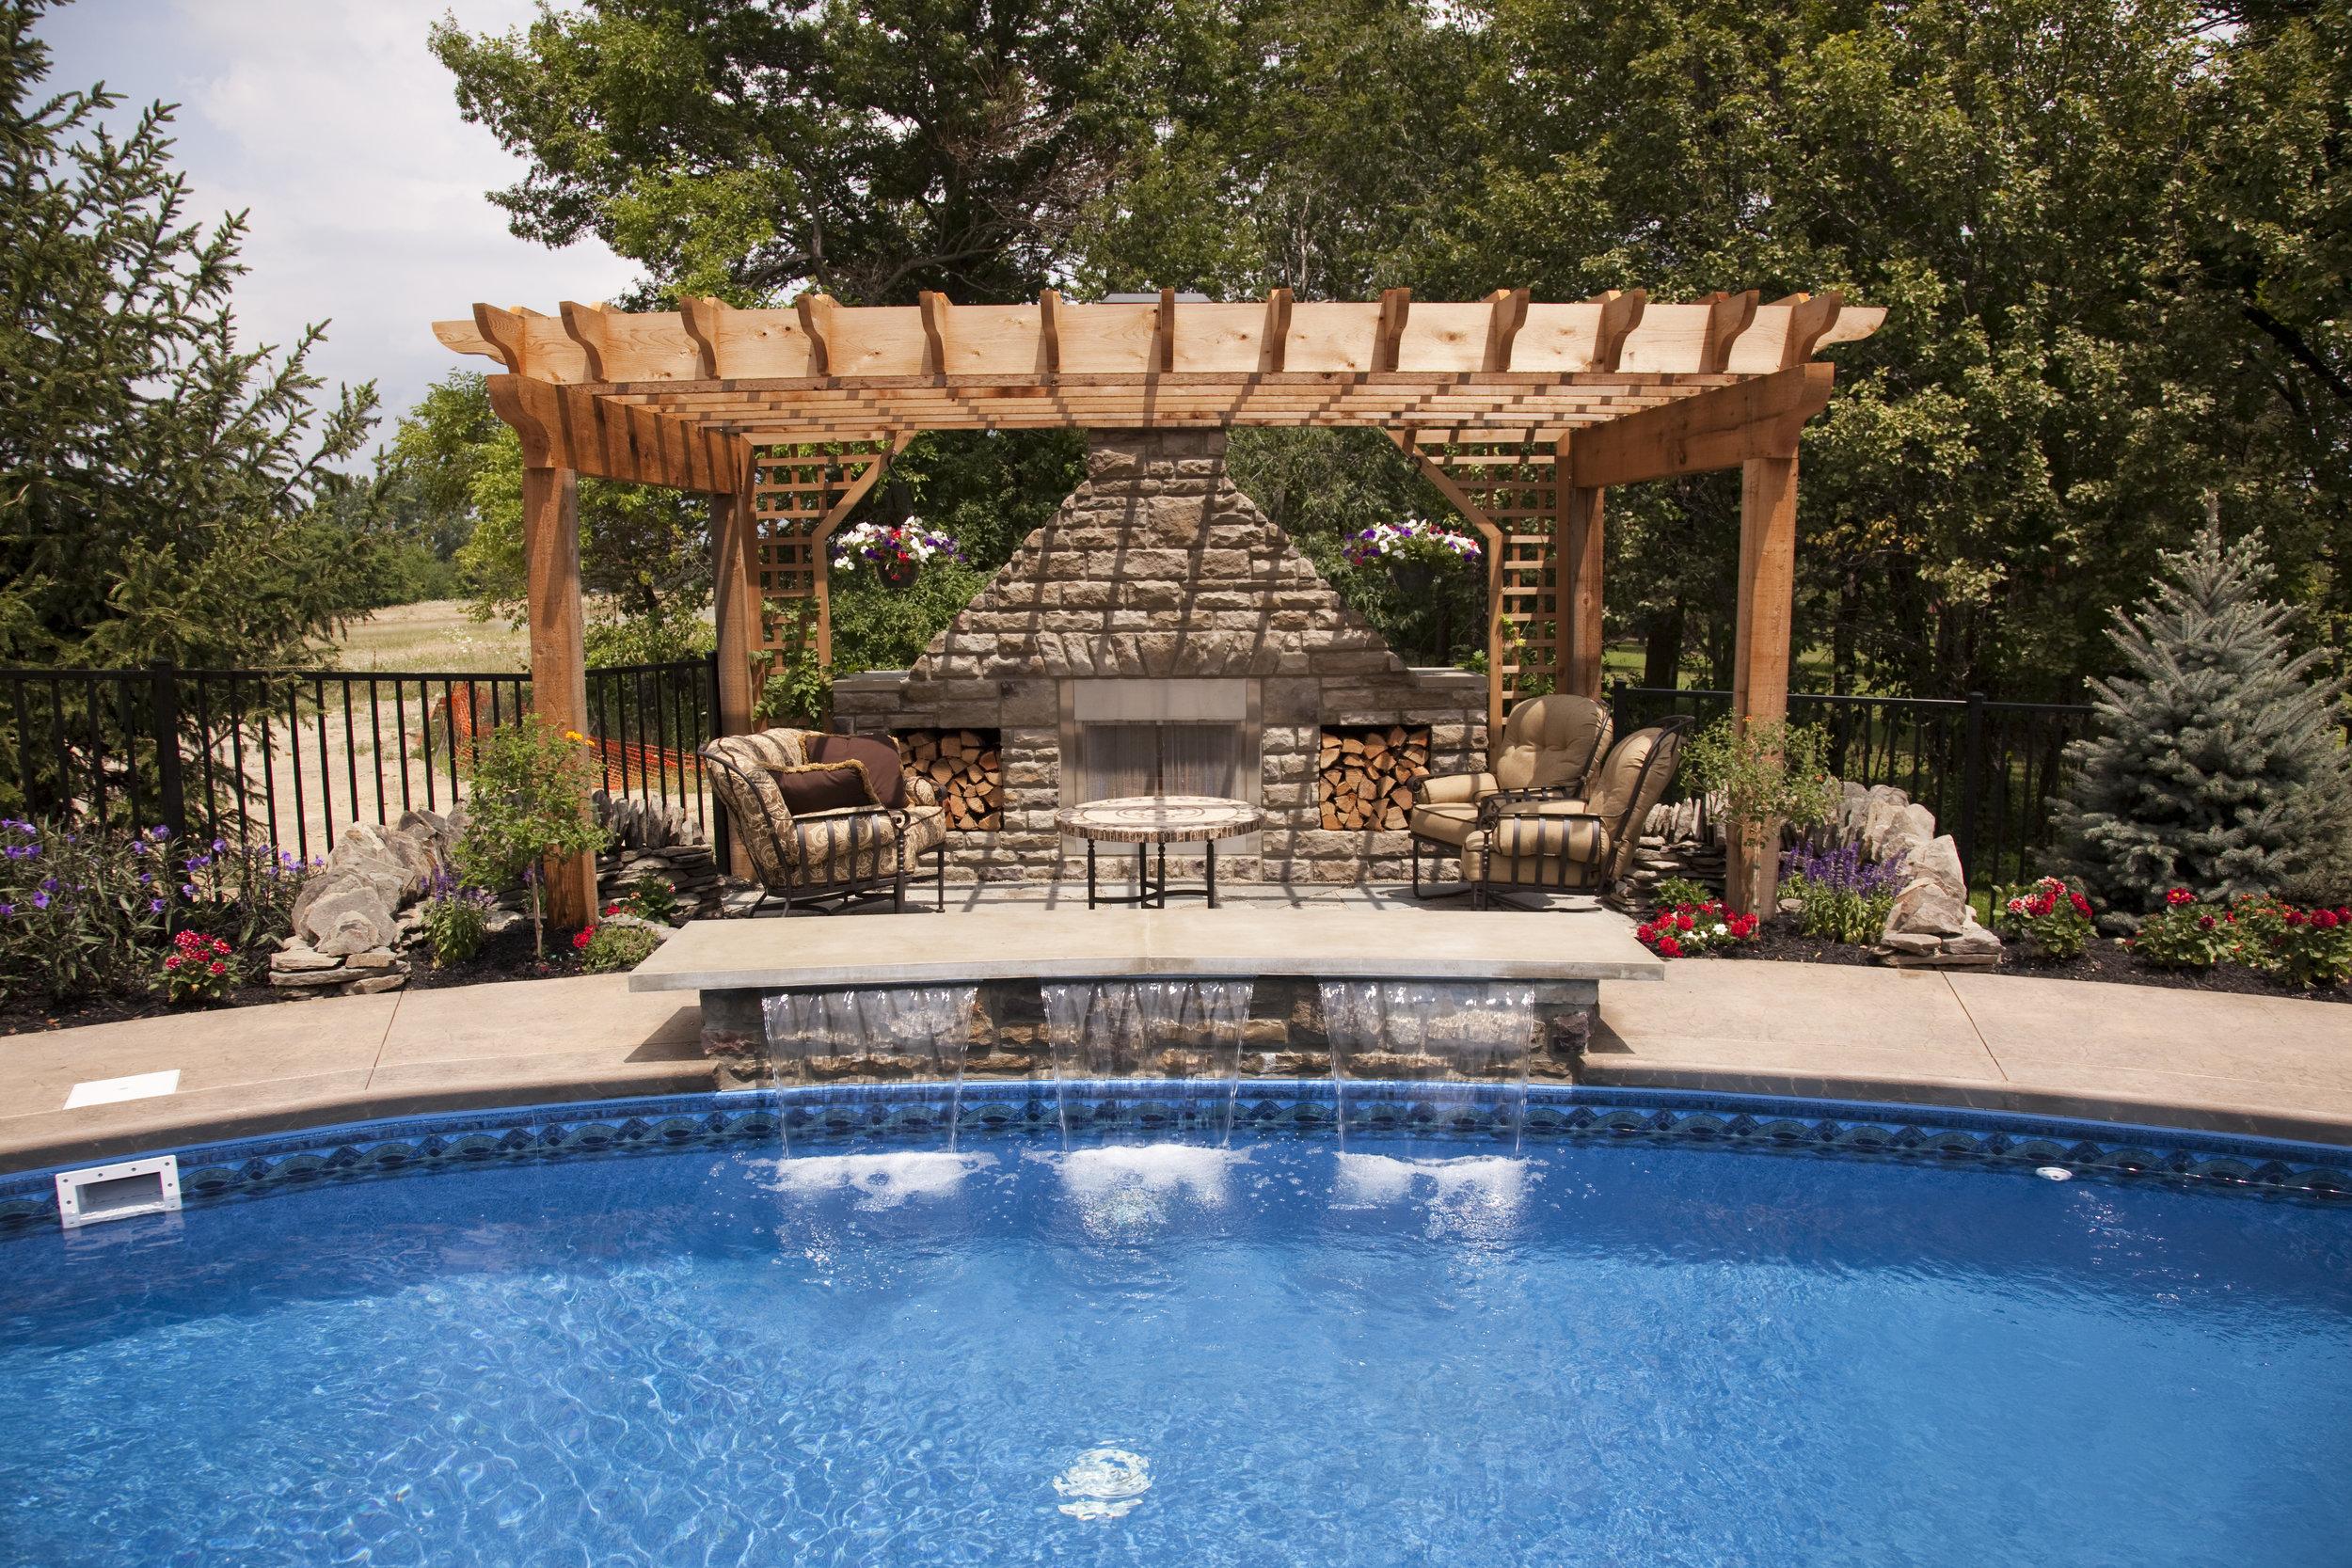 pergola pool fireplace patio landscape design plantings backyard color